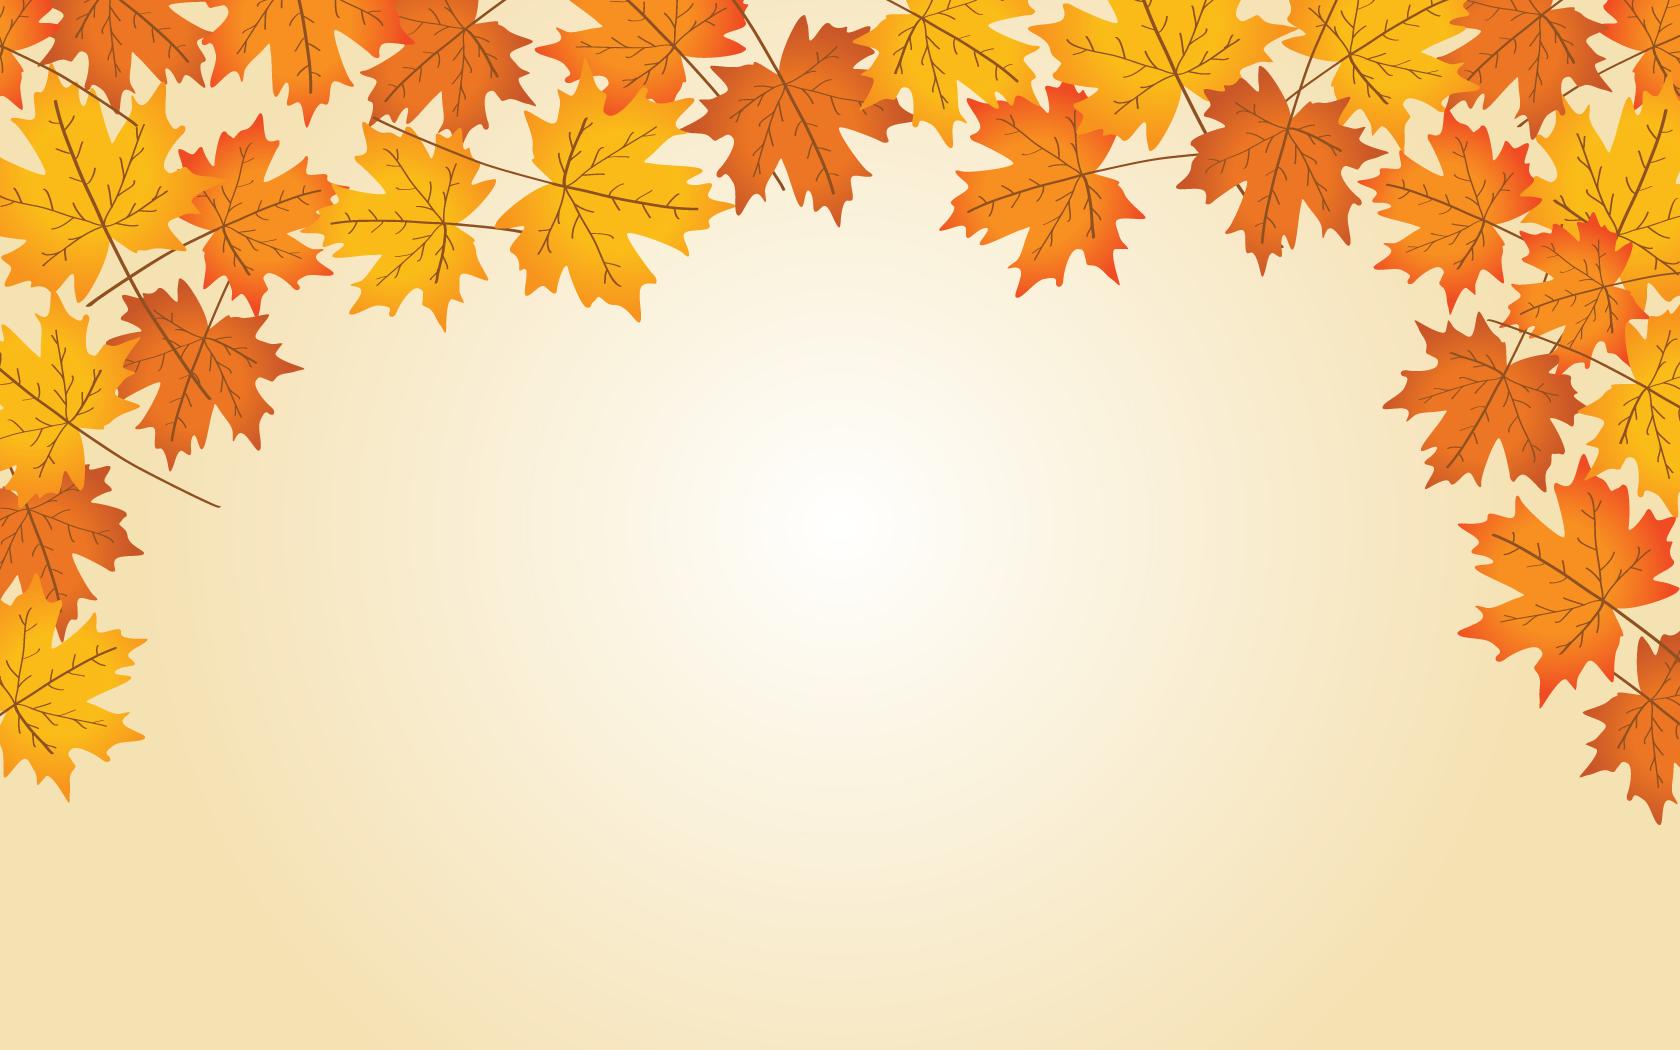 1680x1050 Autumn Vector Background 2729.png Depdc Gms